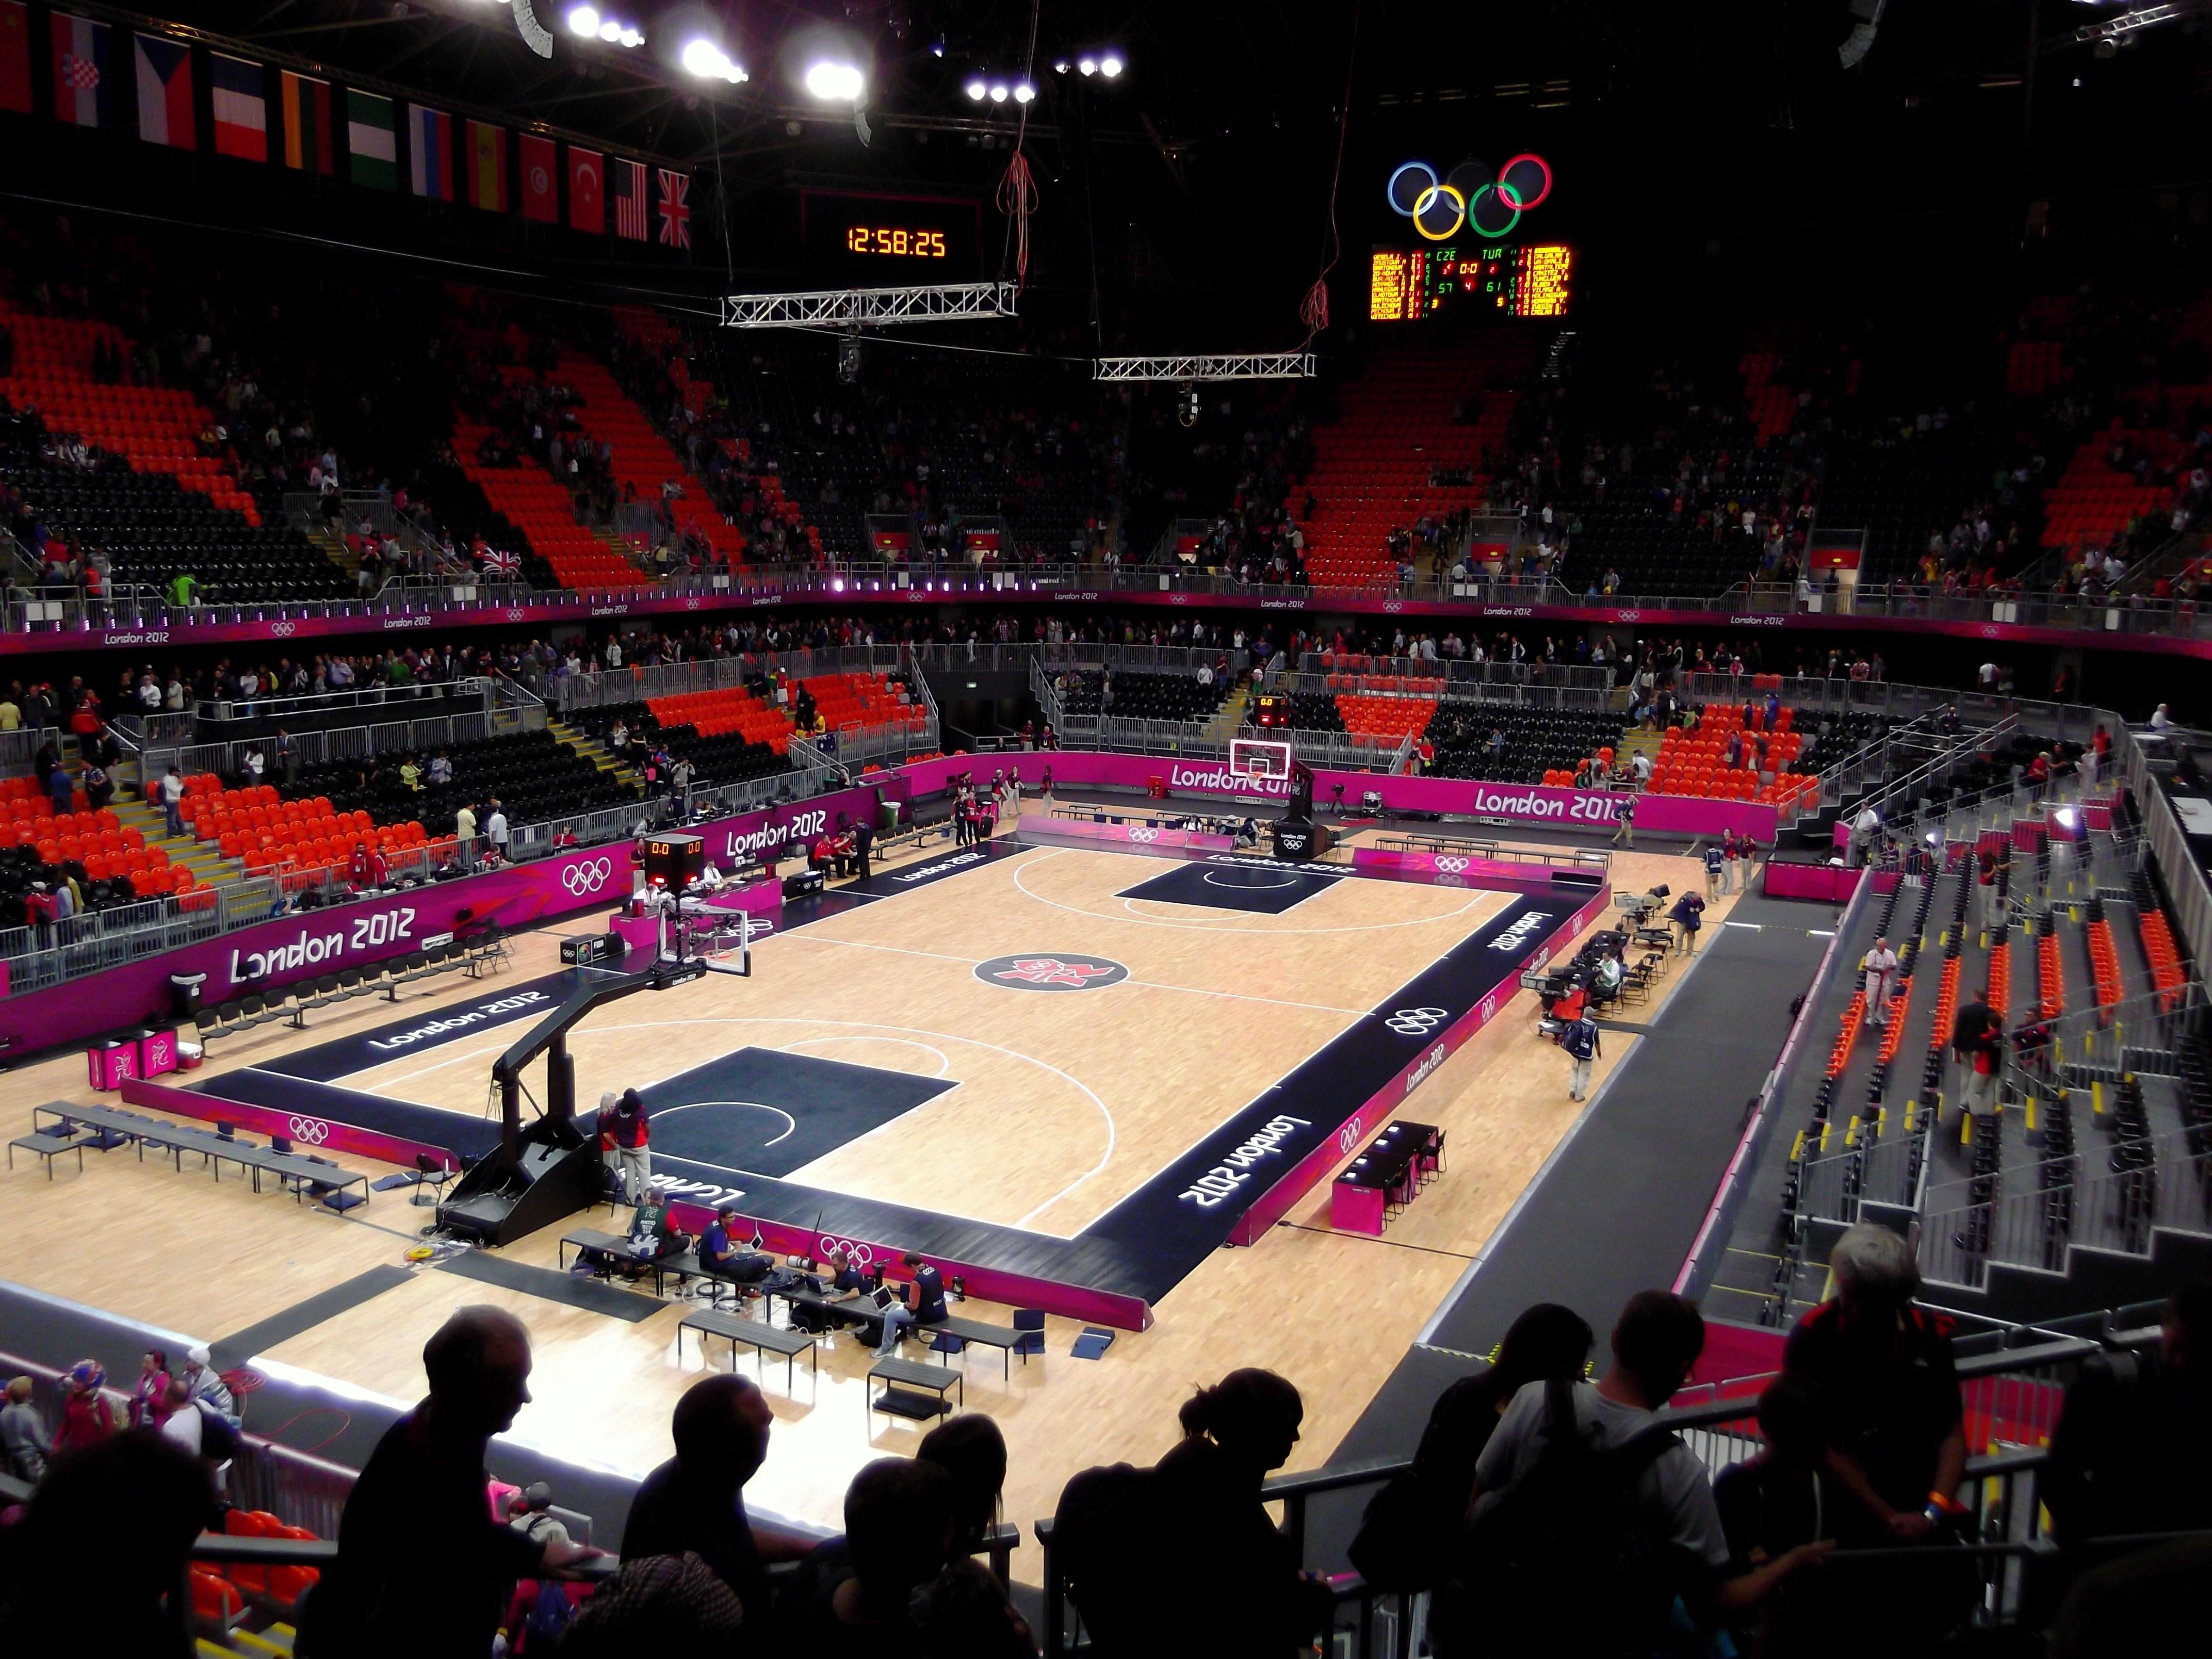 filebasketball arena london 30 july 2012 2jpg